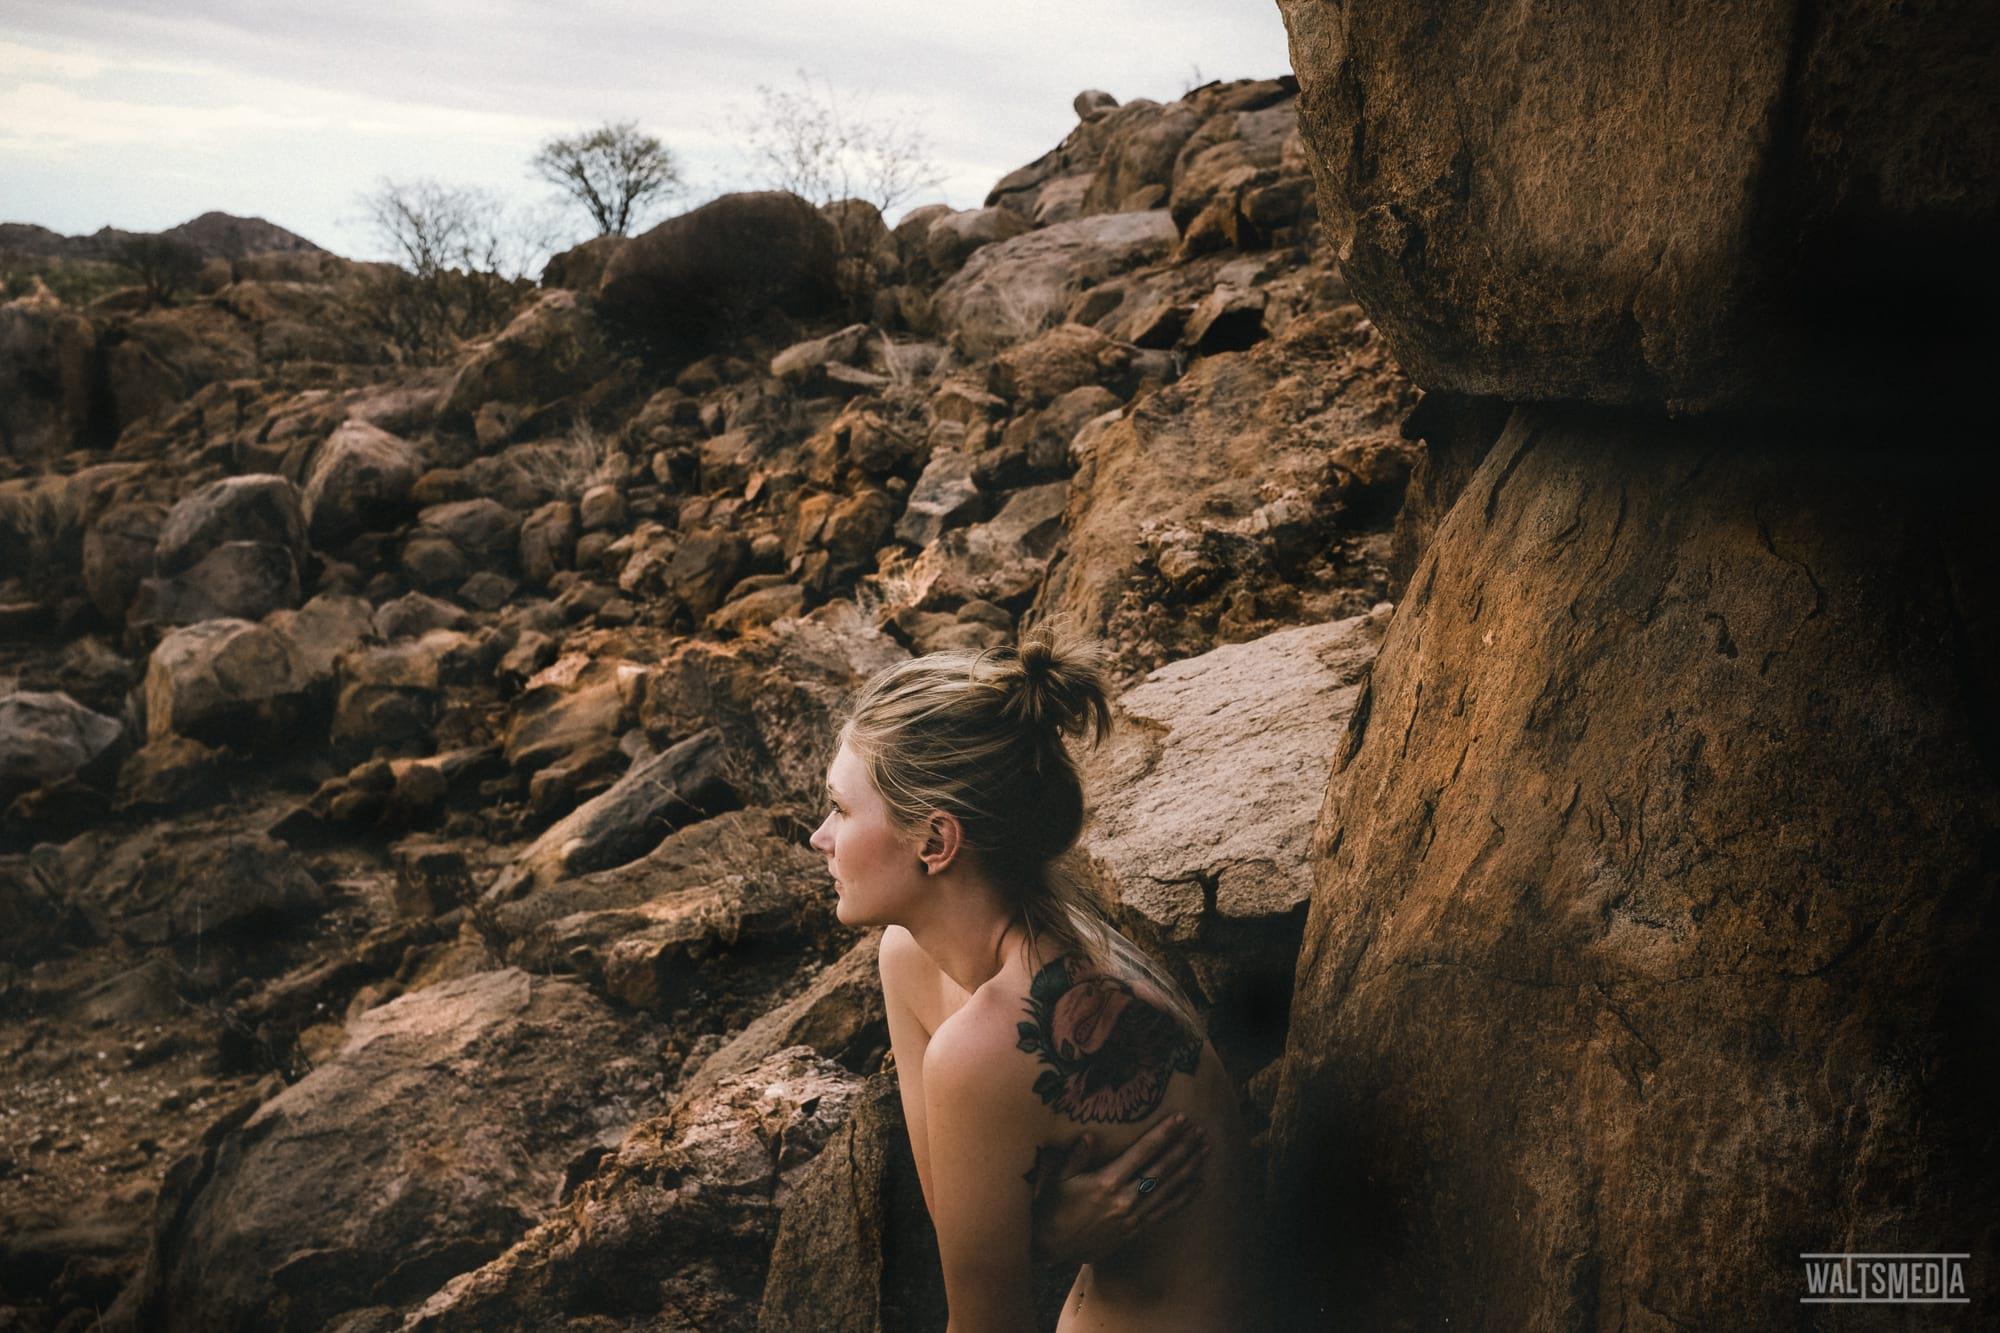 waltsmedia-namibia-travel-portrait-65-34